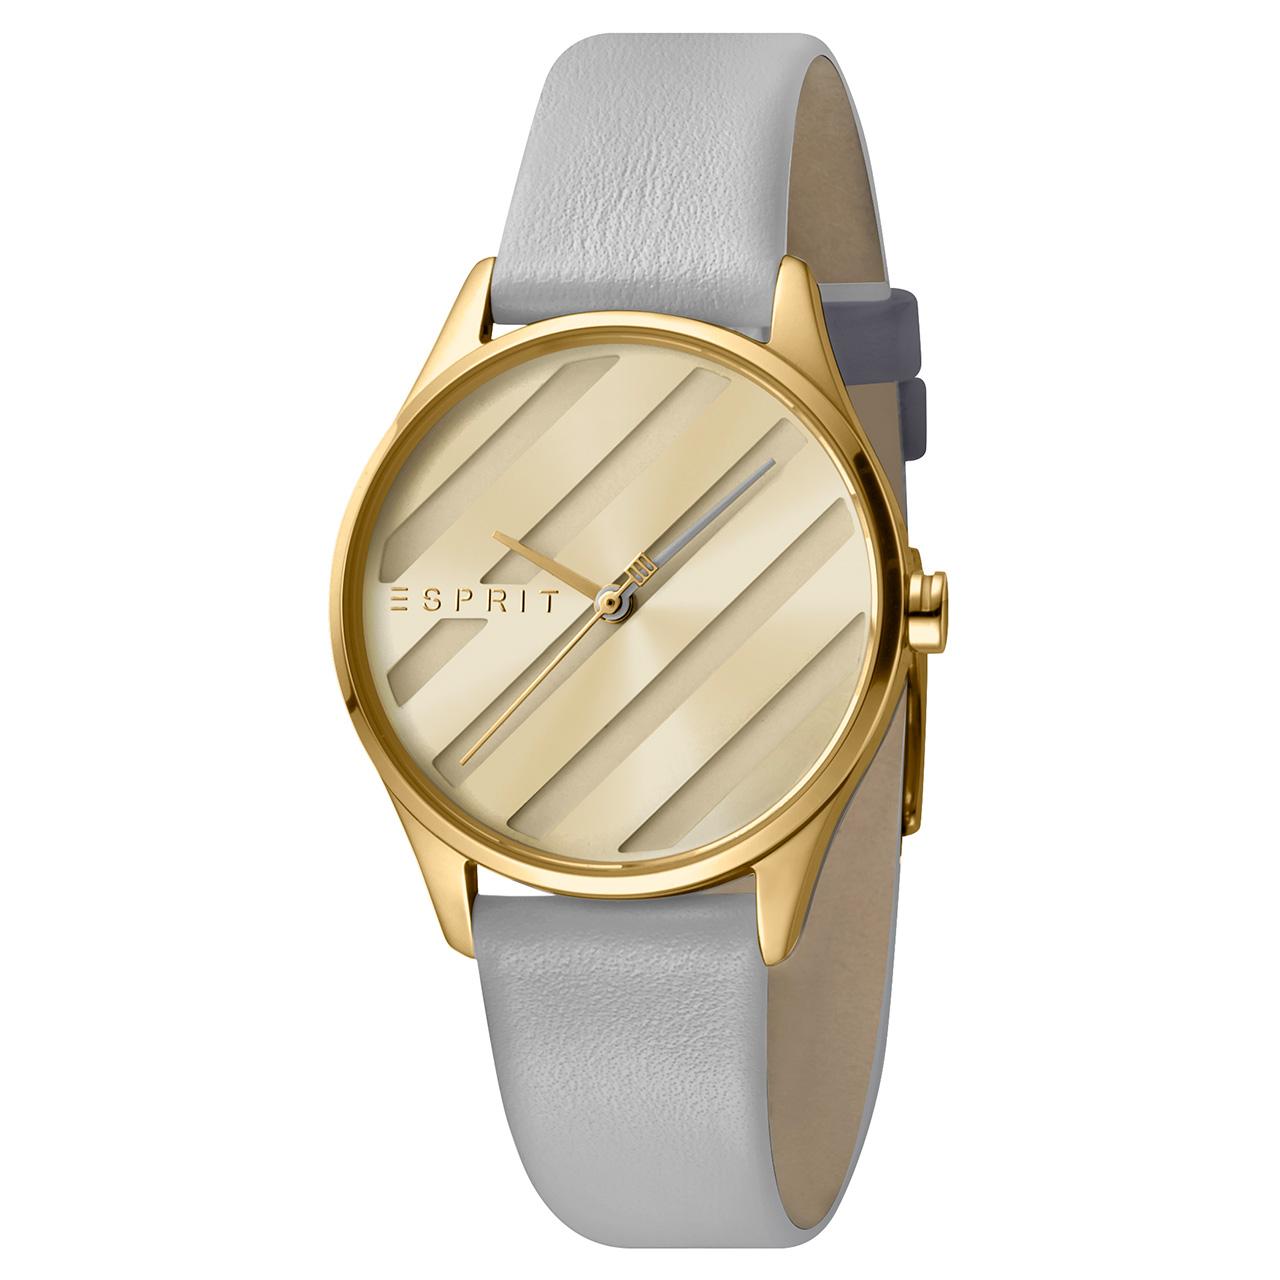 ساعت مچی عقربه ای زنانه اسپریت مدل ES1L029L0025